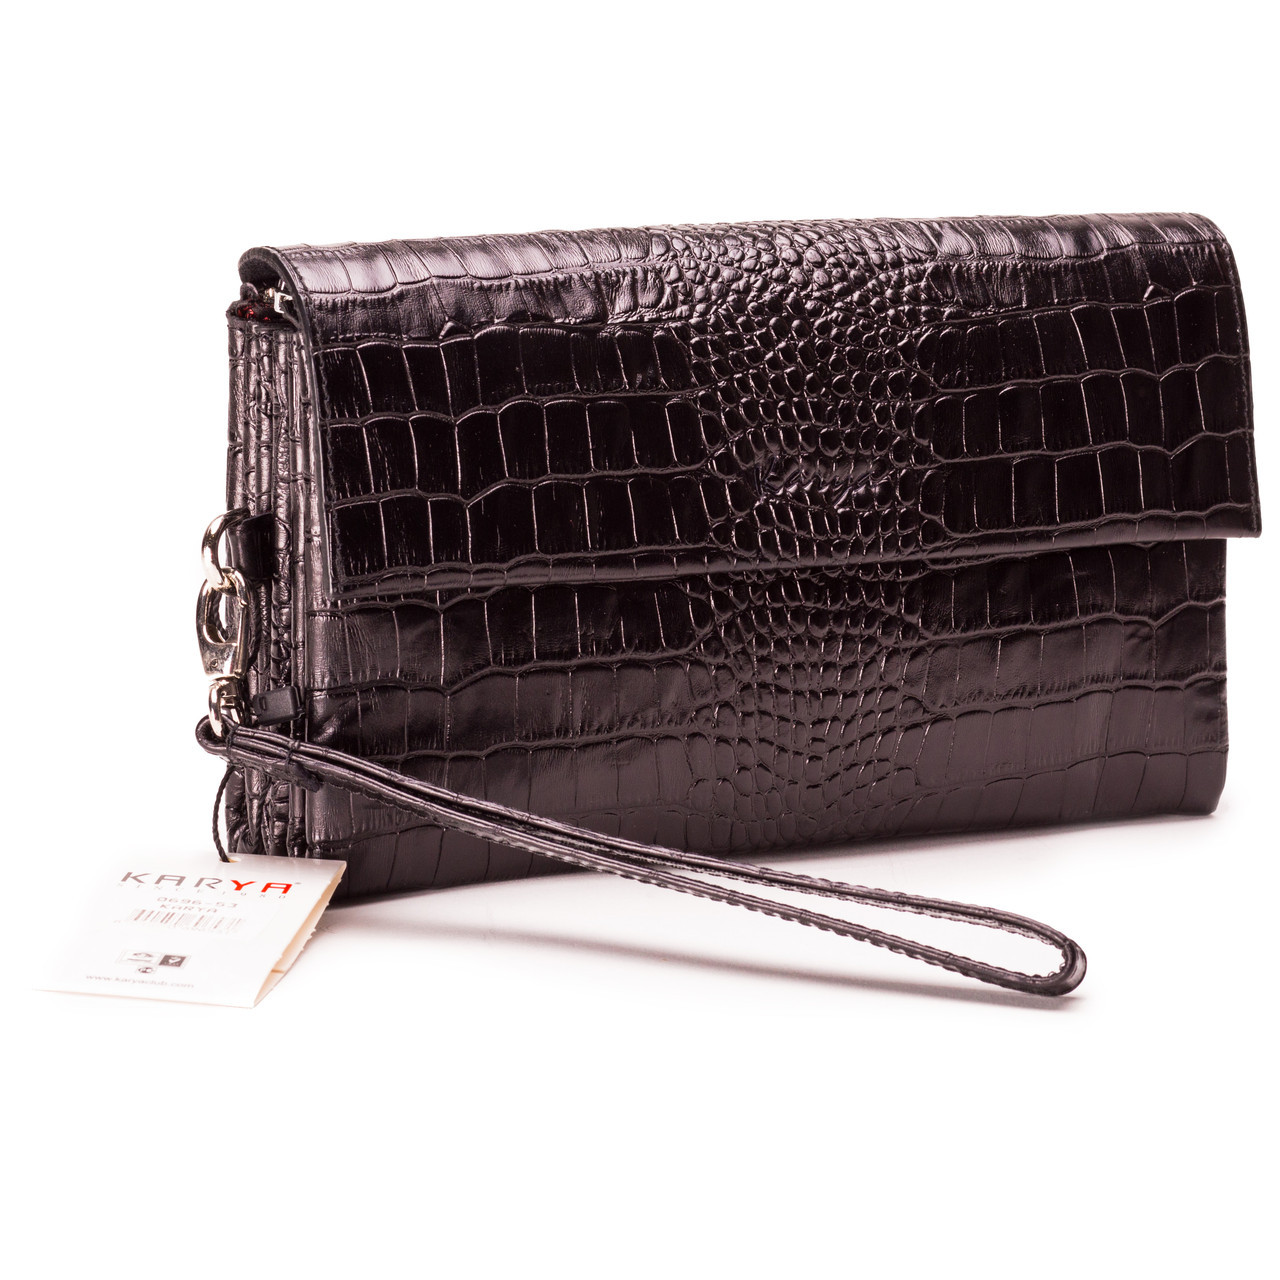 Чоловіча сумка барсетка шкіряна чорна   Мужская сумка барсетка кожаная  черная Karya 0696-53 1c4464c6d7b66